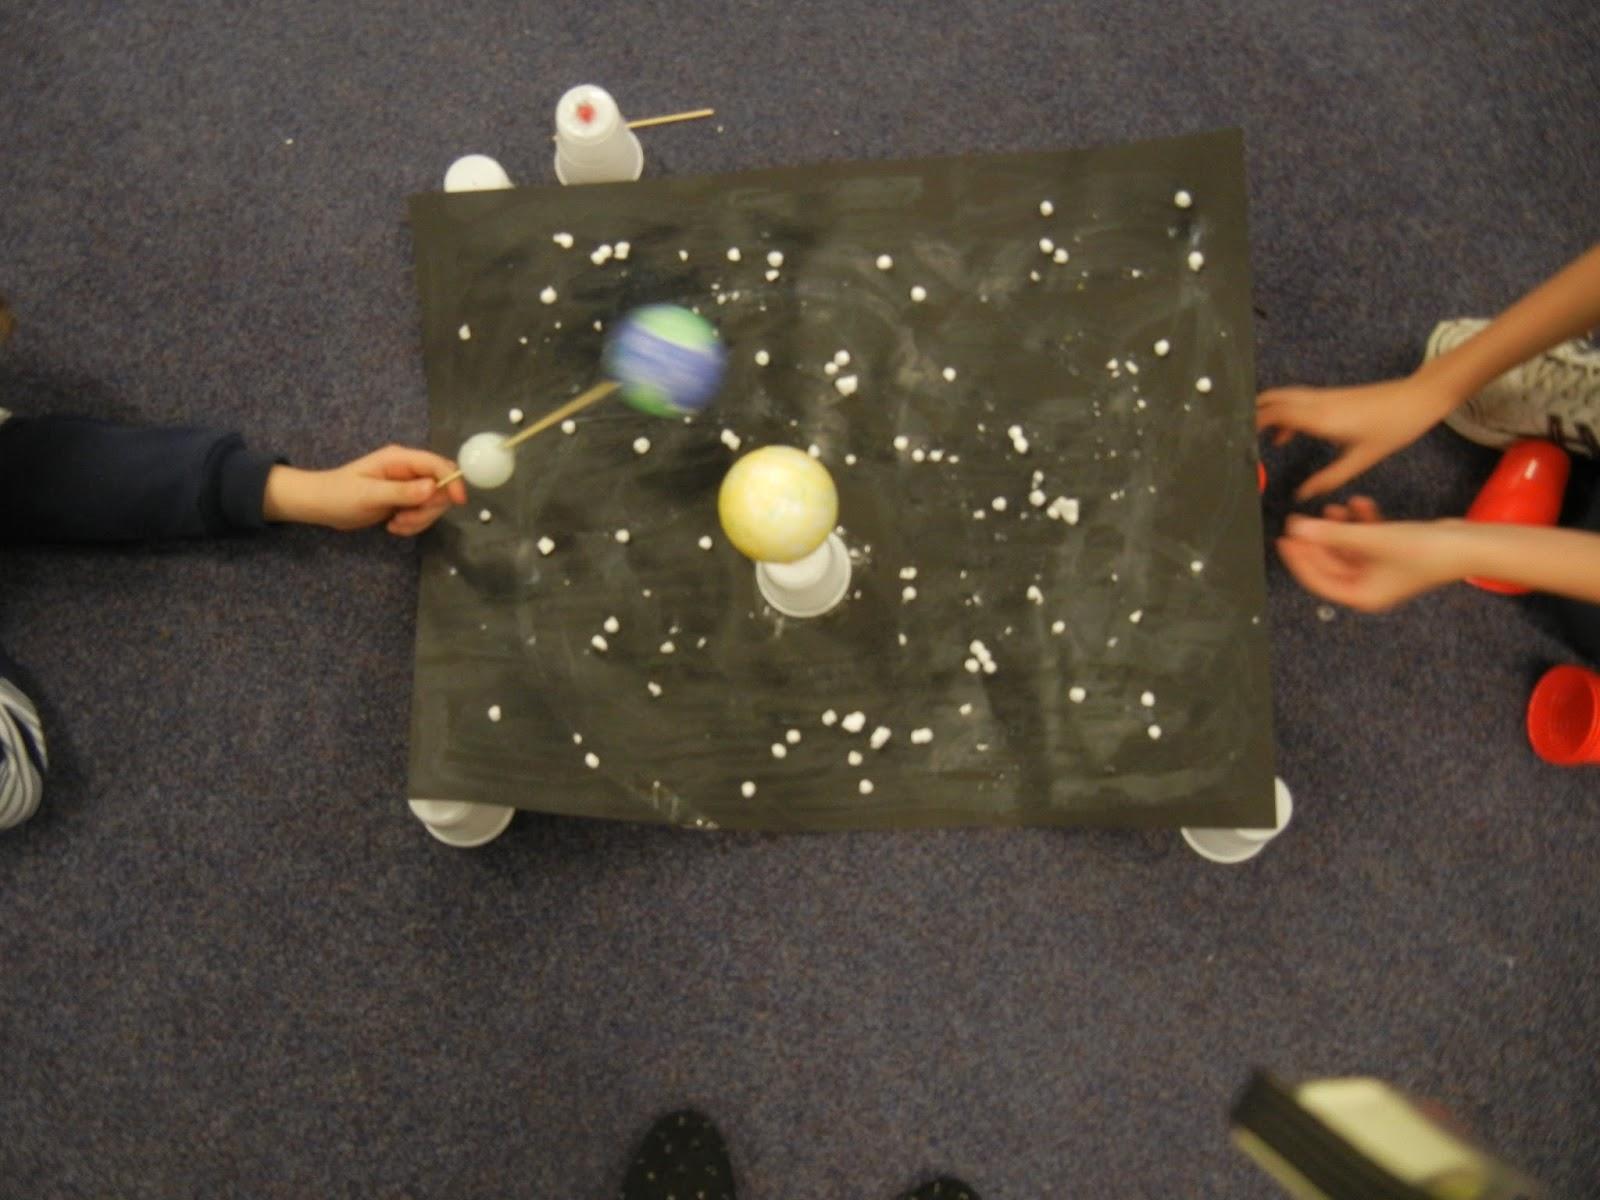 box solar system model - photo #11